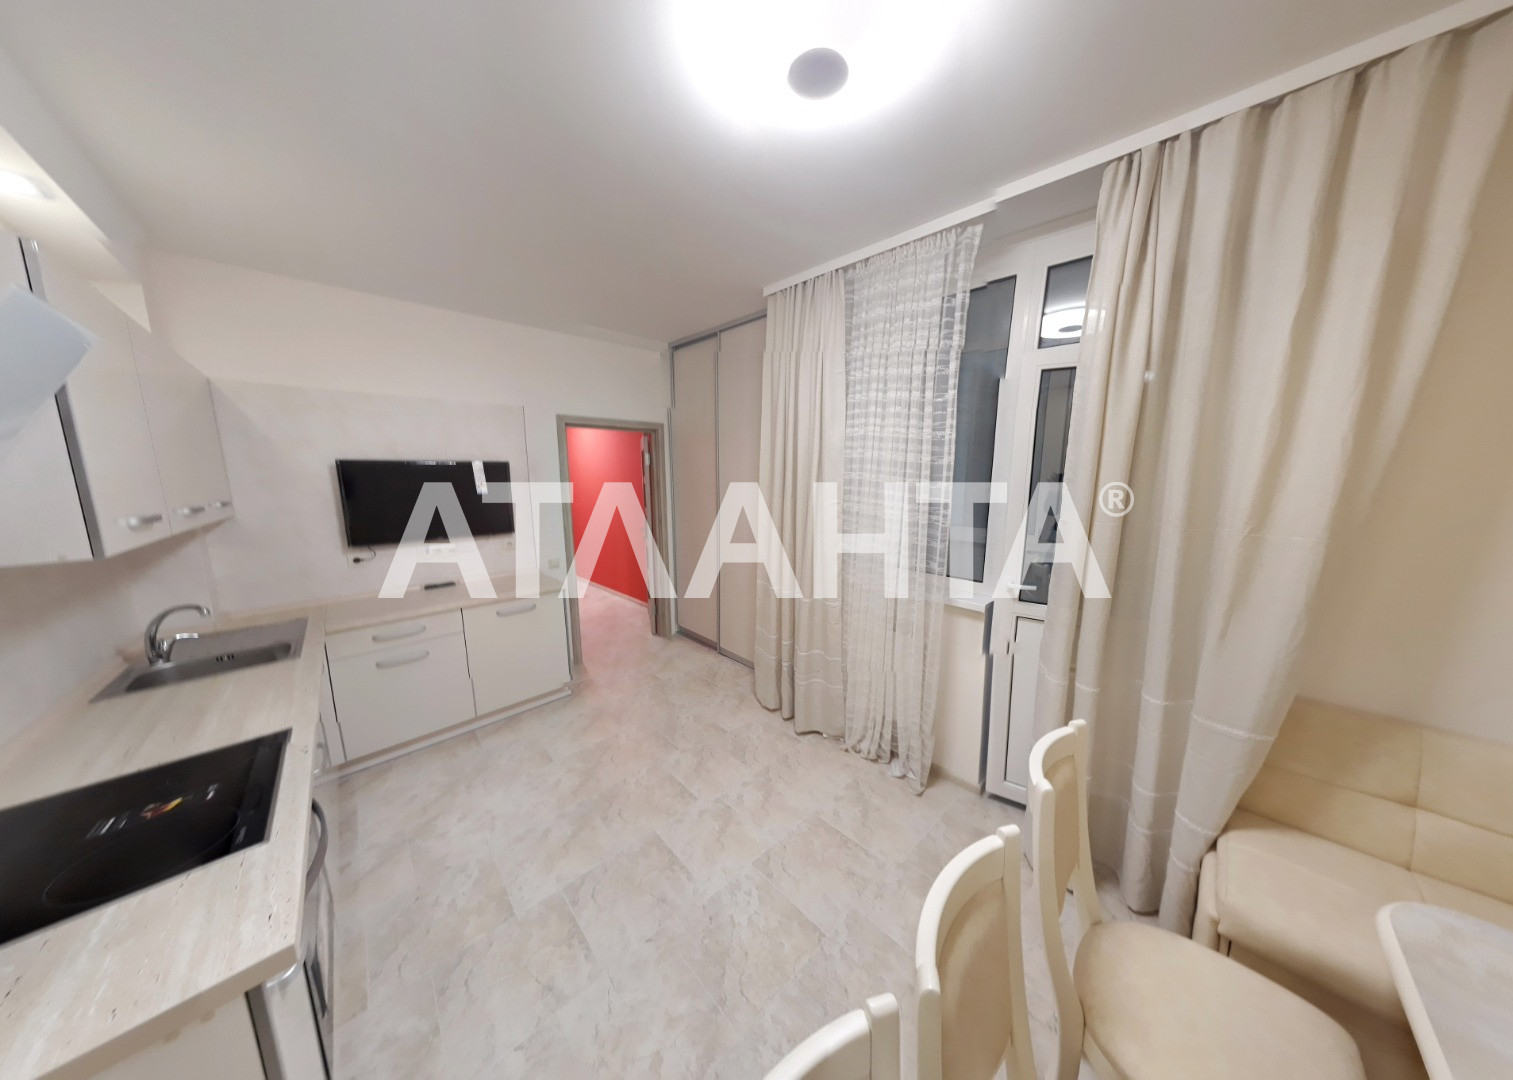 Продается 2-комнатная Квартира на ул. Академика Вильямса — 127 000 у.е.